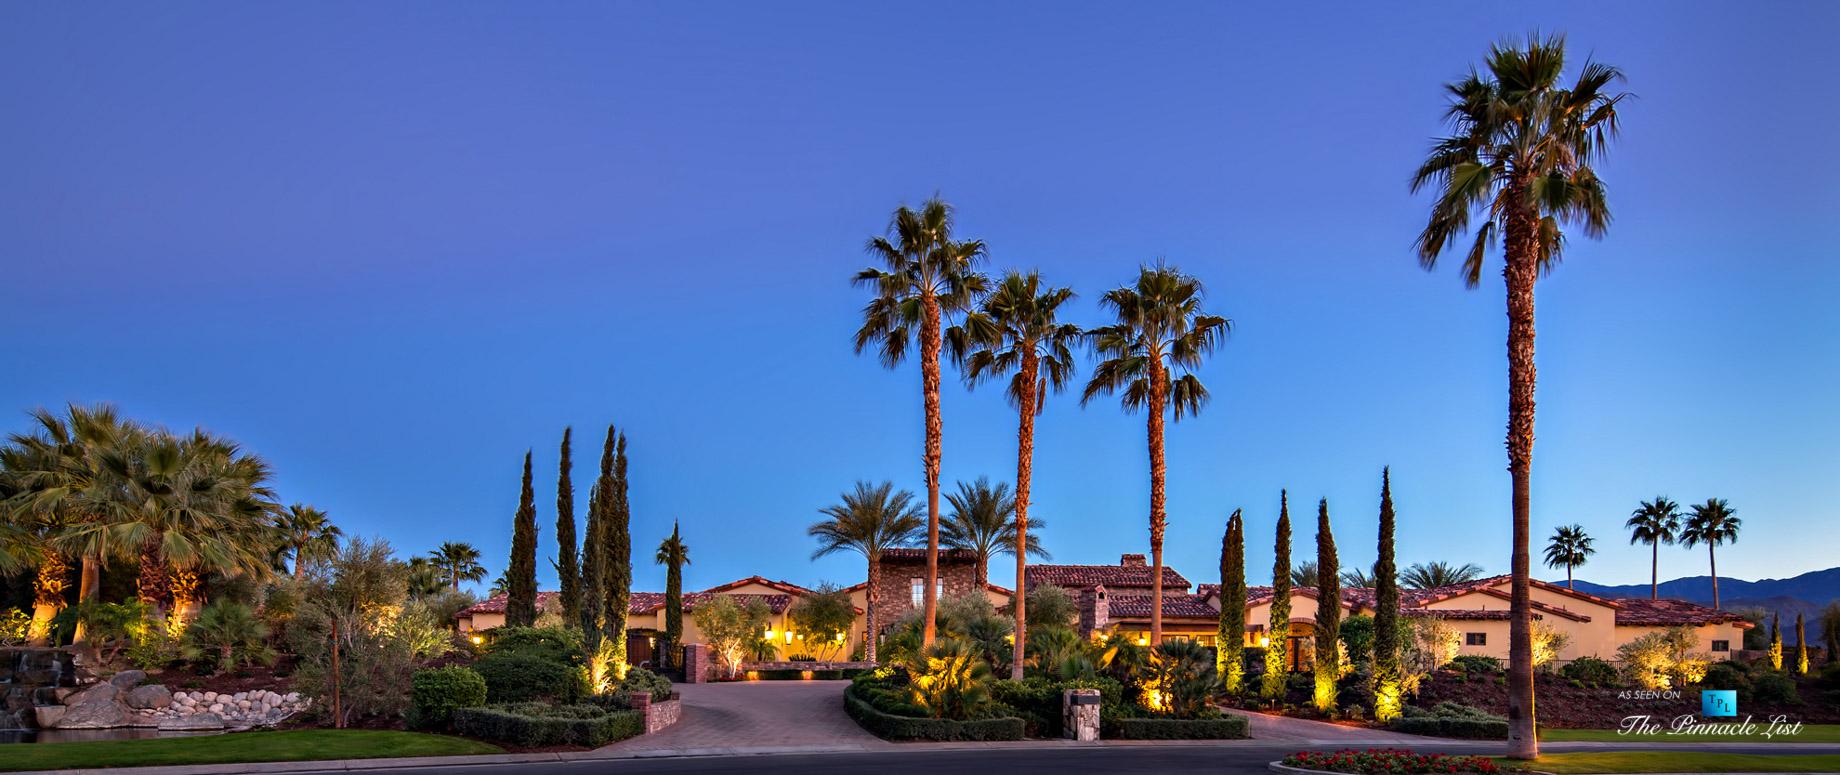 Villa Oliveto – 57370 Peninsula Ln, La Quinta, CA, USA